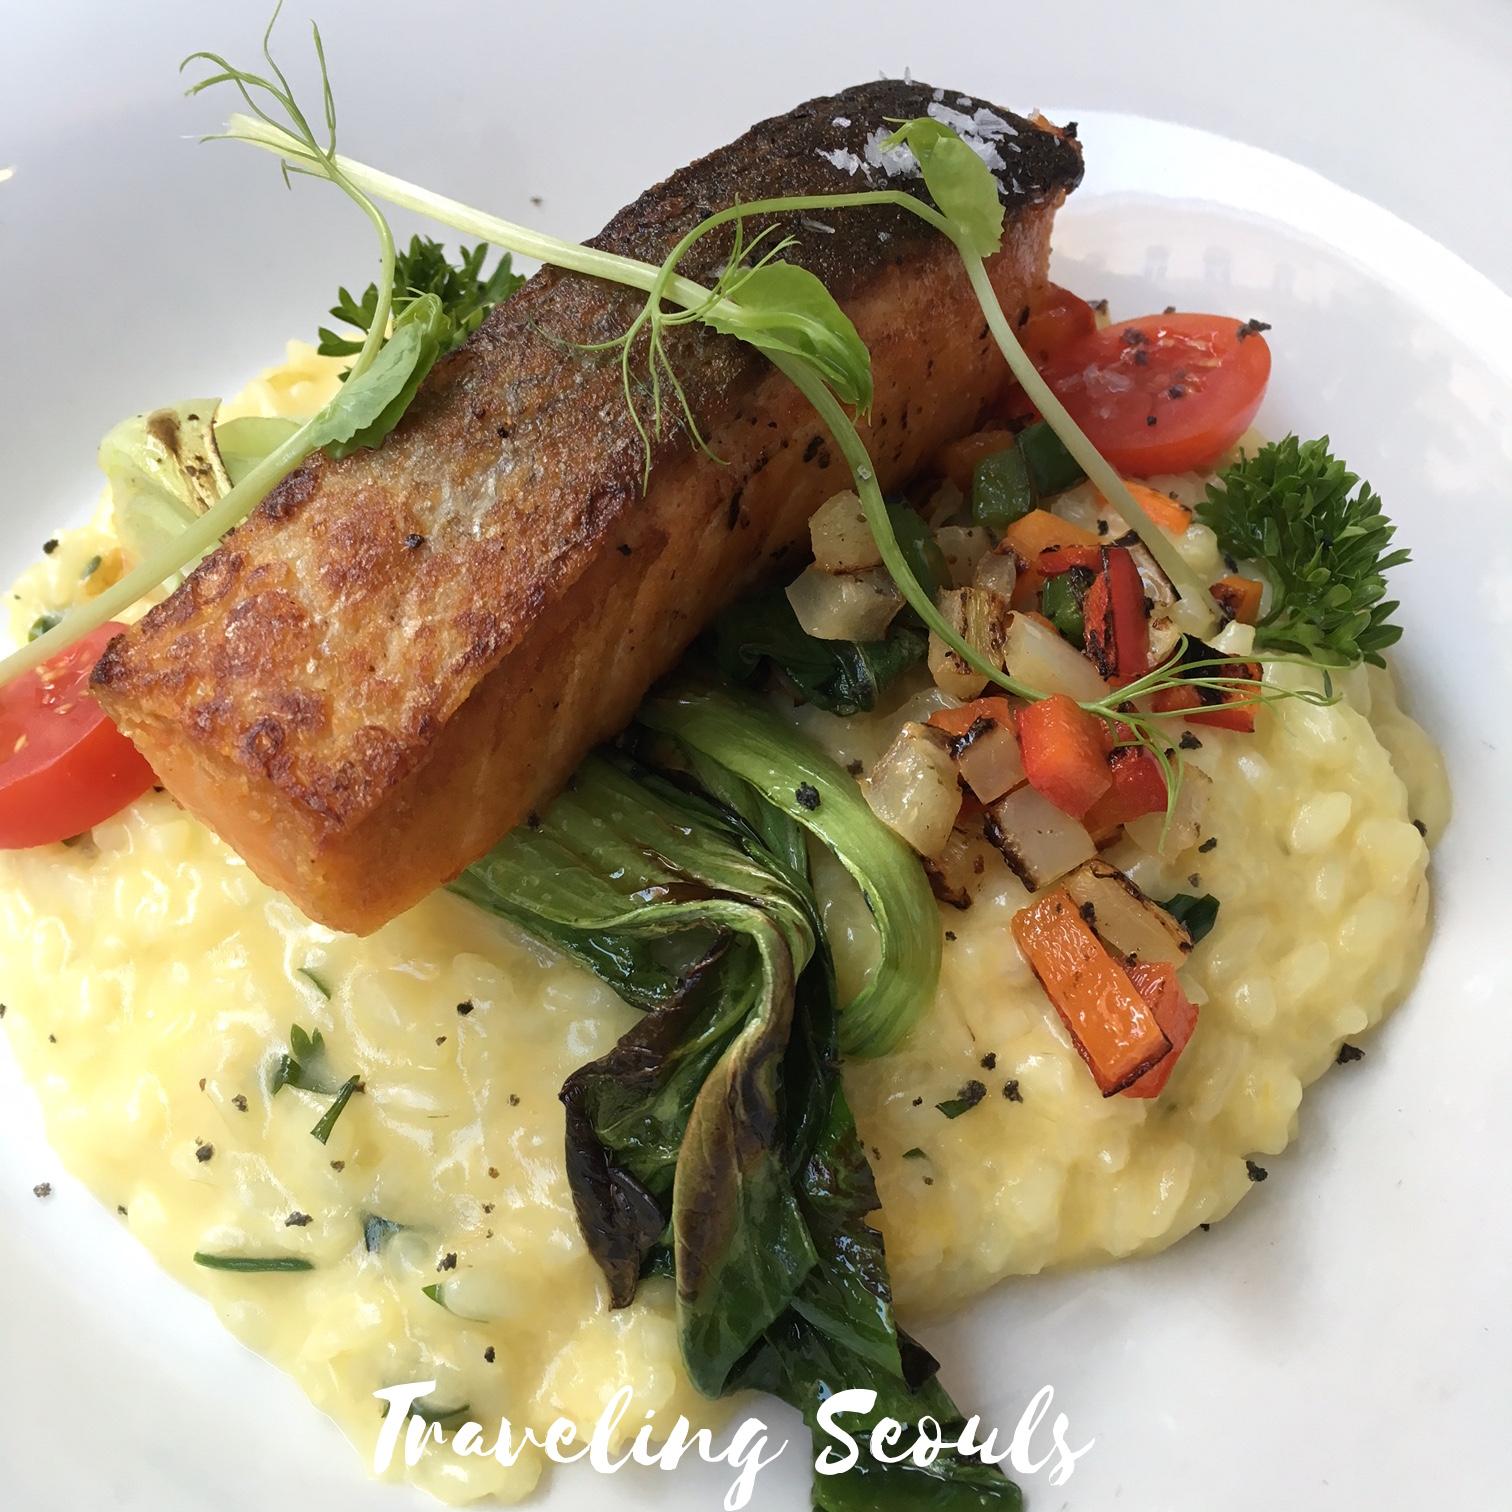 budapest bistro bisztro hungary restaurant salmon